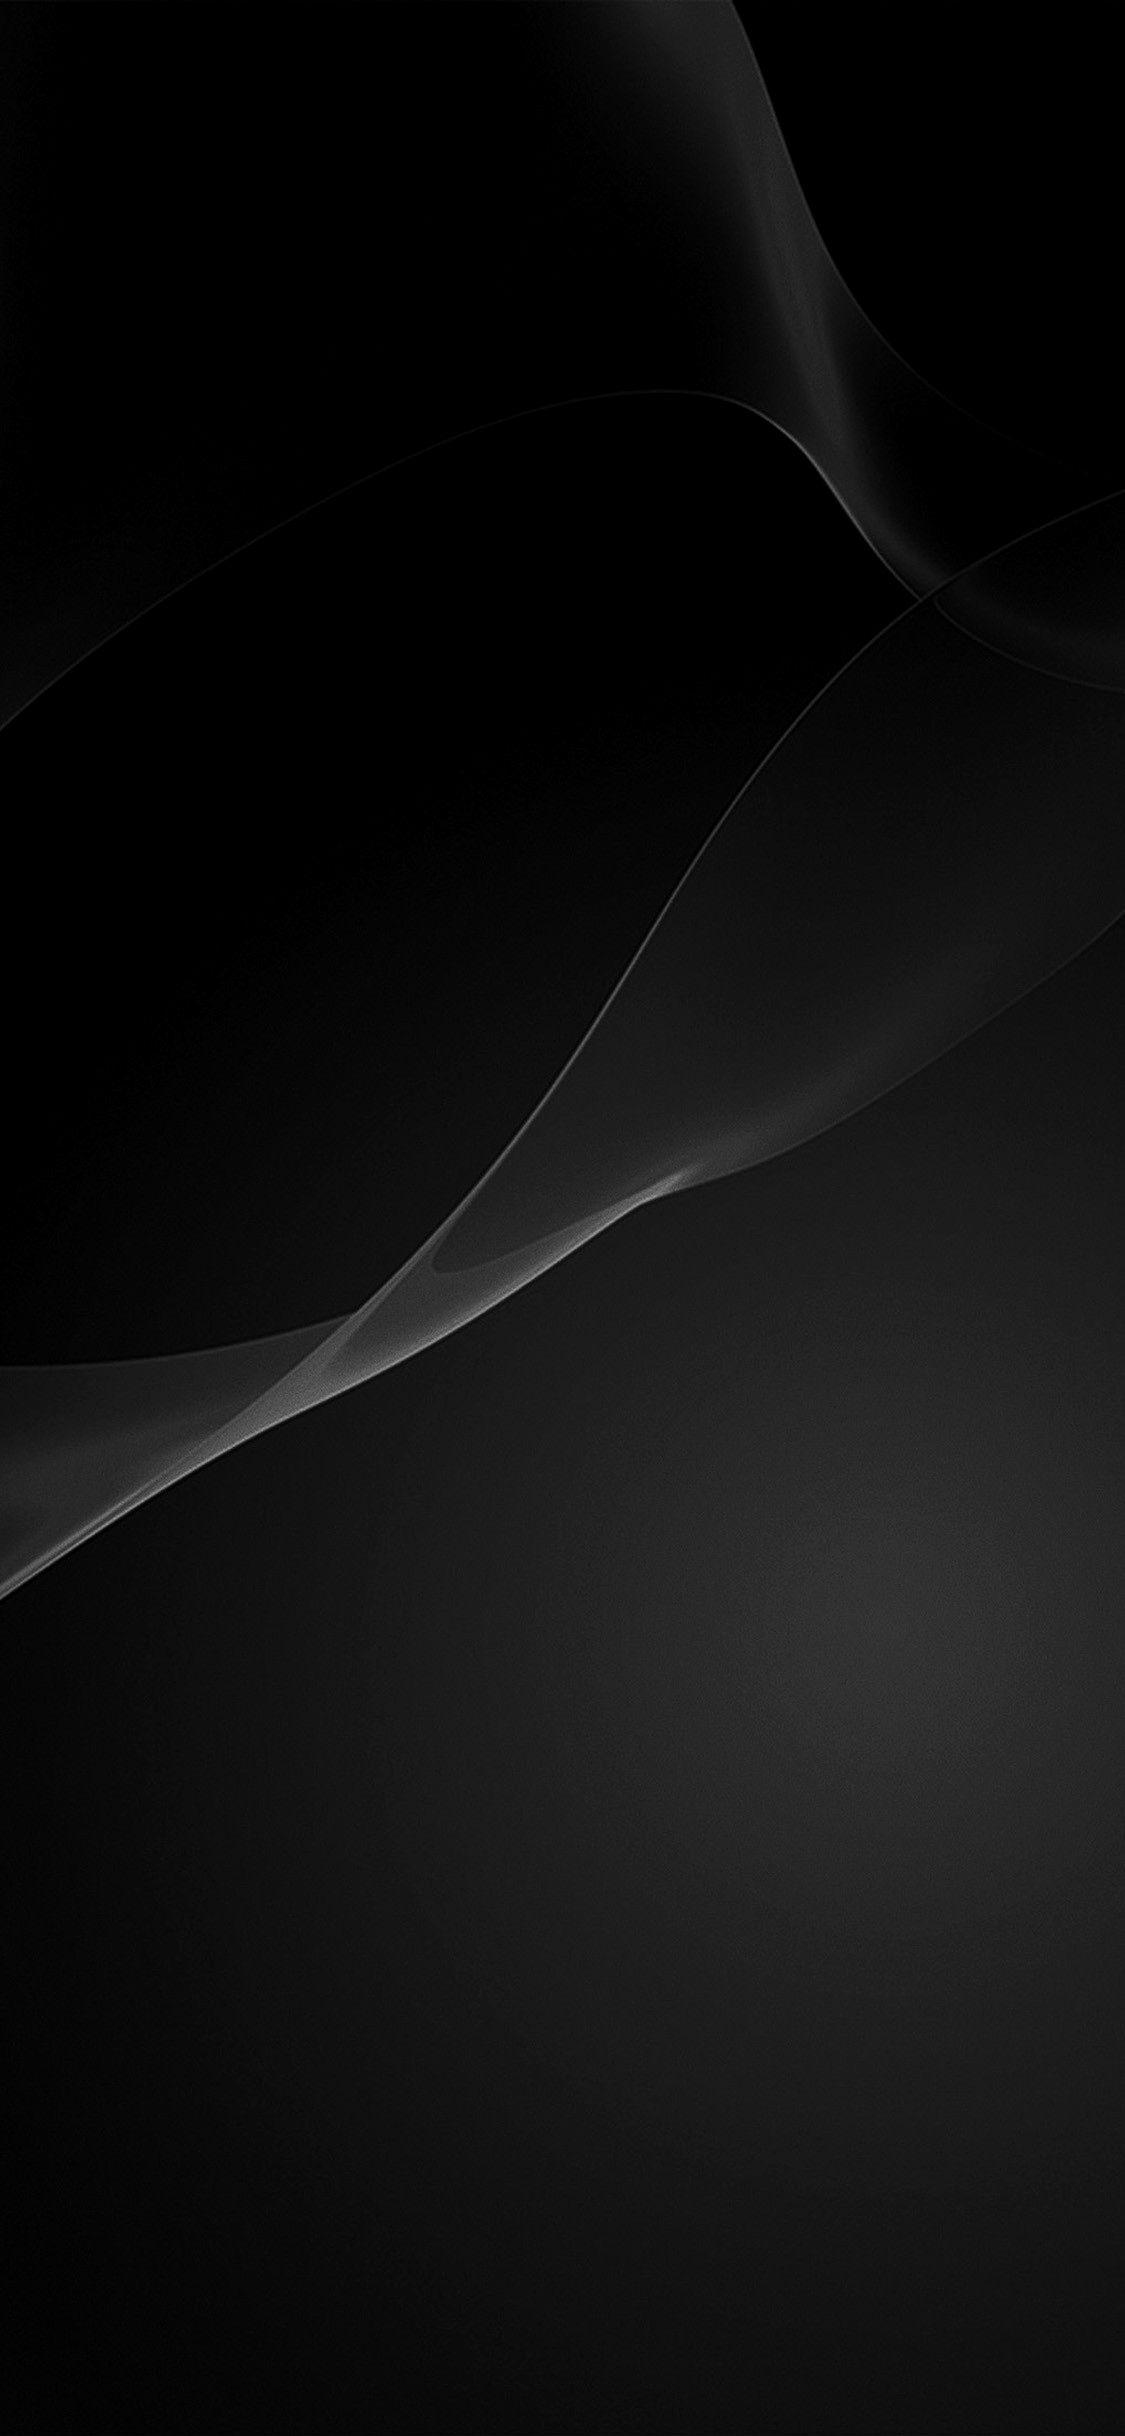 Black Abstract Wallpaper 4k Iphone Ideas Abstract Iphone Wallpaper Black Abstract Abstract Wallpaper